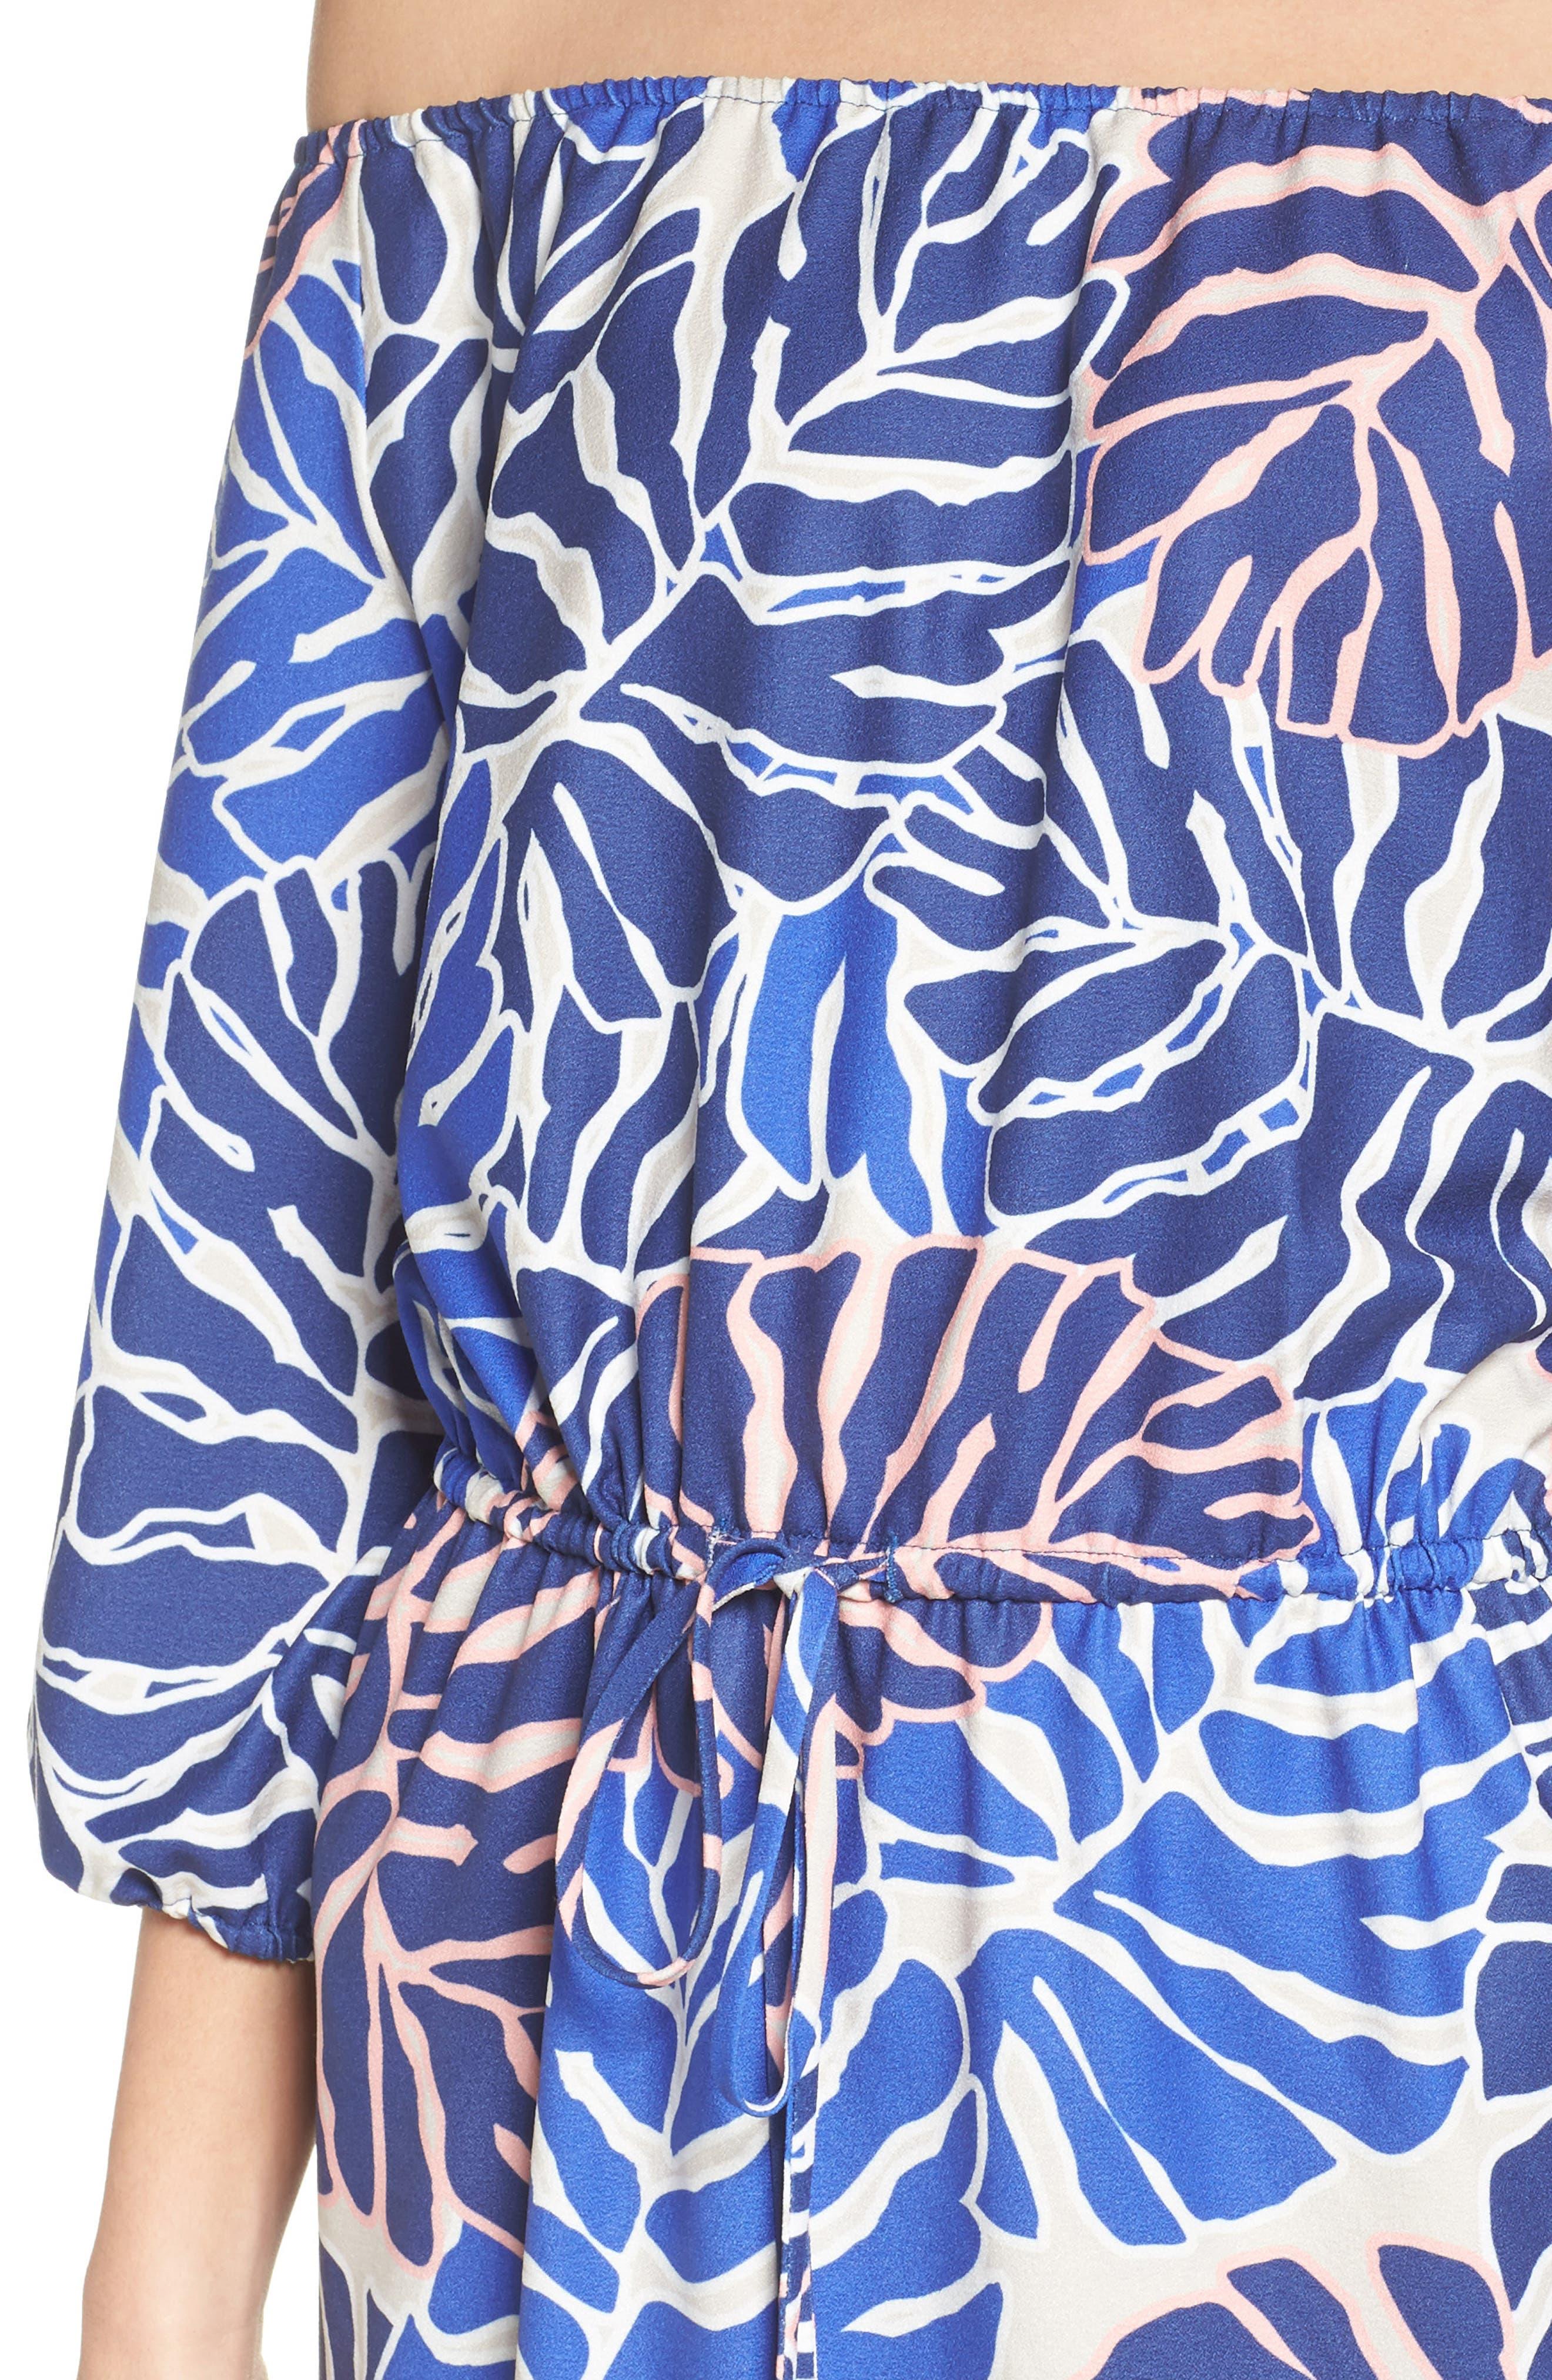 Leilani Off the Shoulder Dress,                             Alternate thumbnail 4, color,                             418